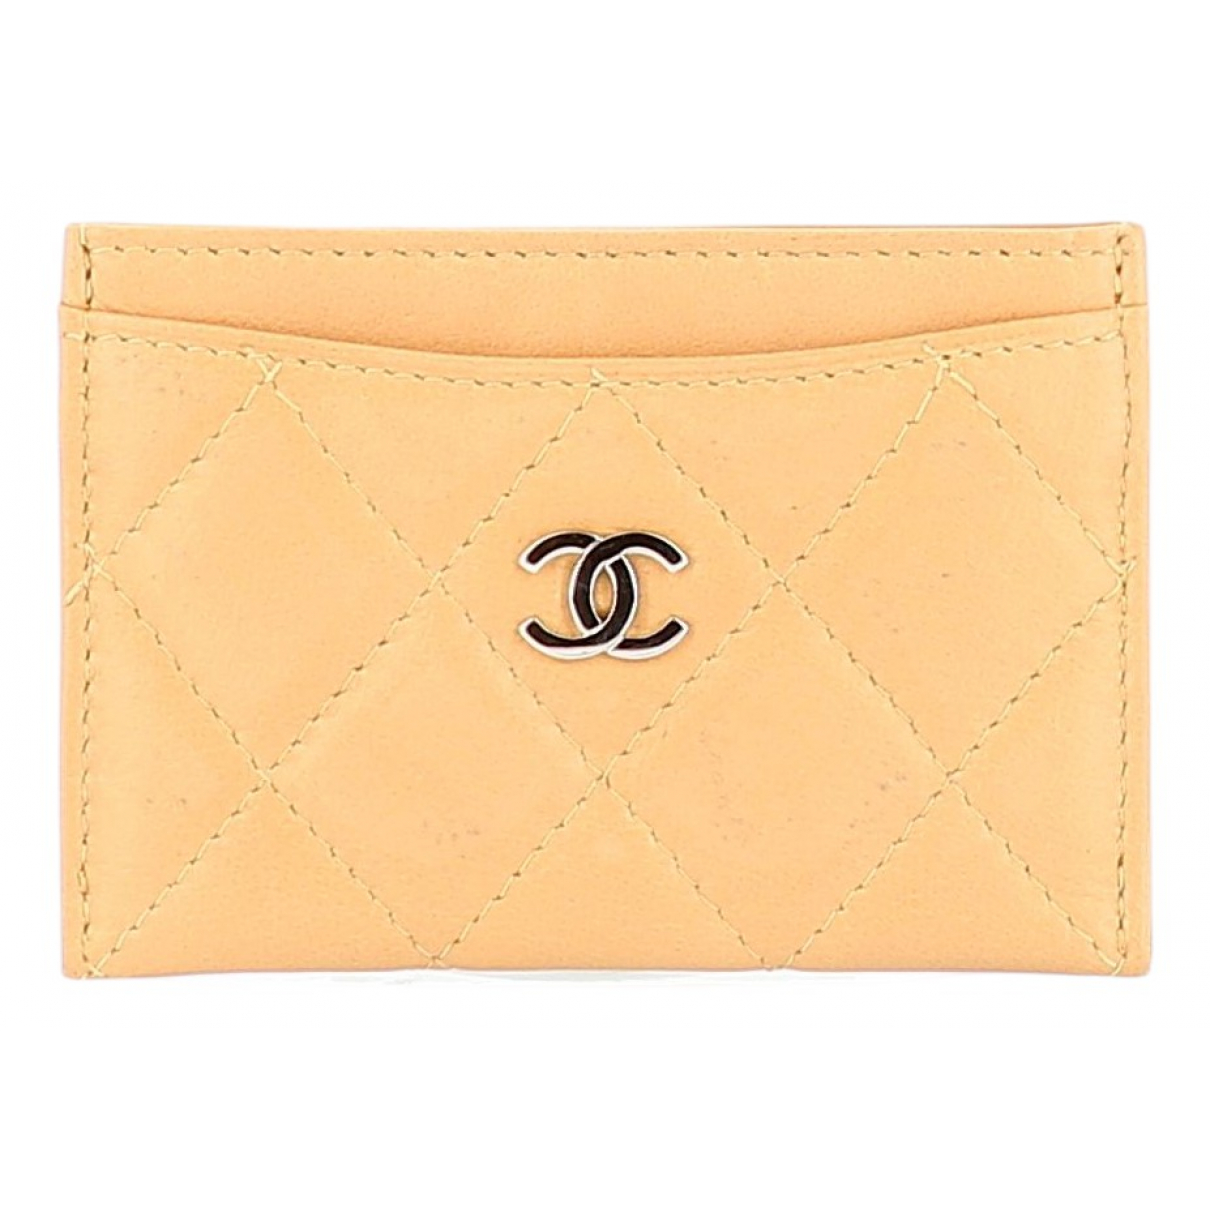 Chanel \N Beige Leather Purses, wallet & cases for Women \N